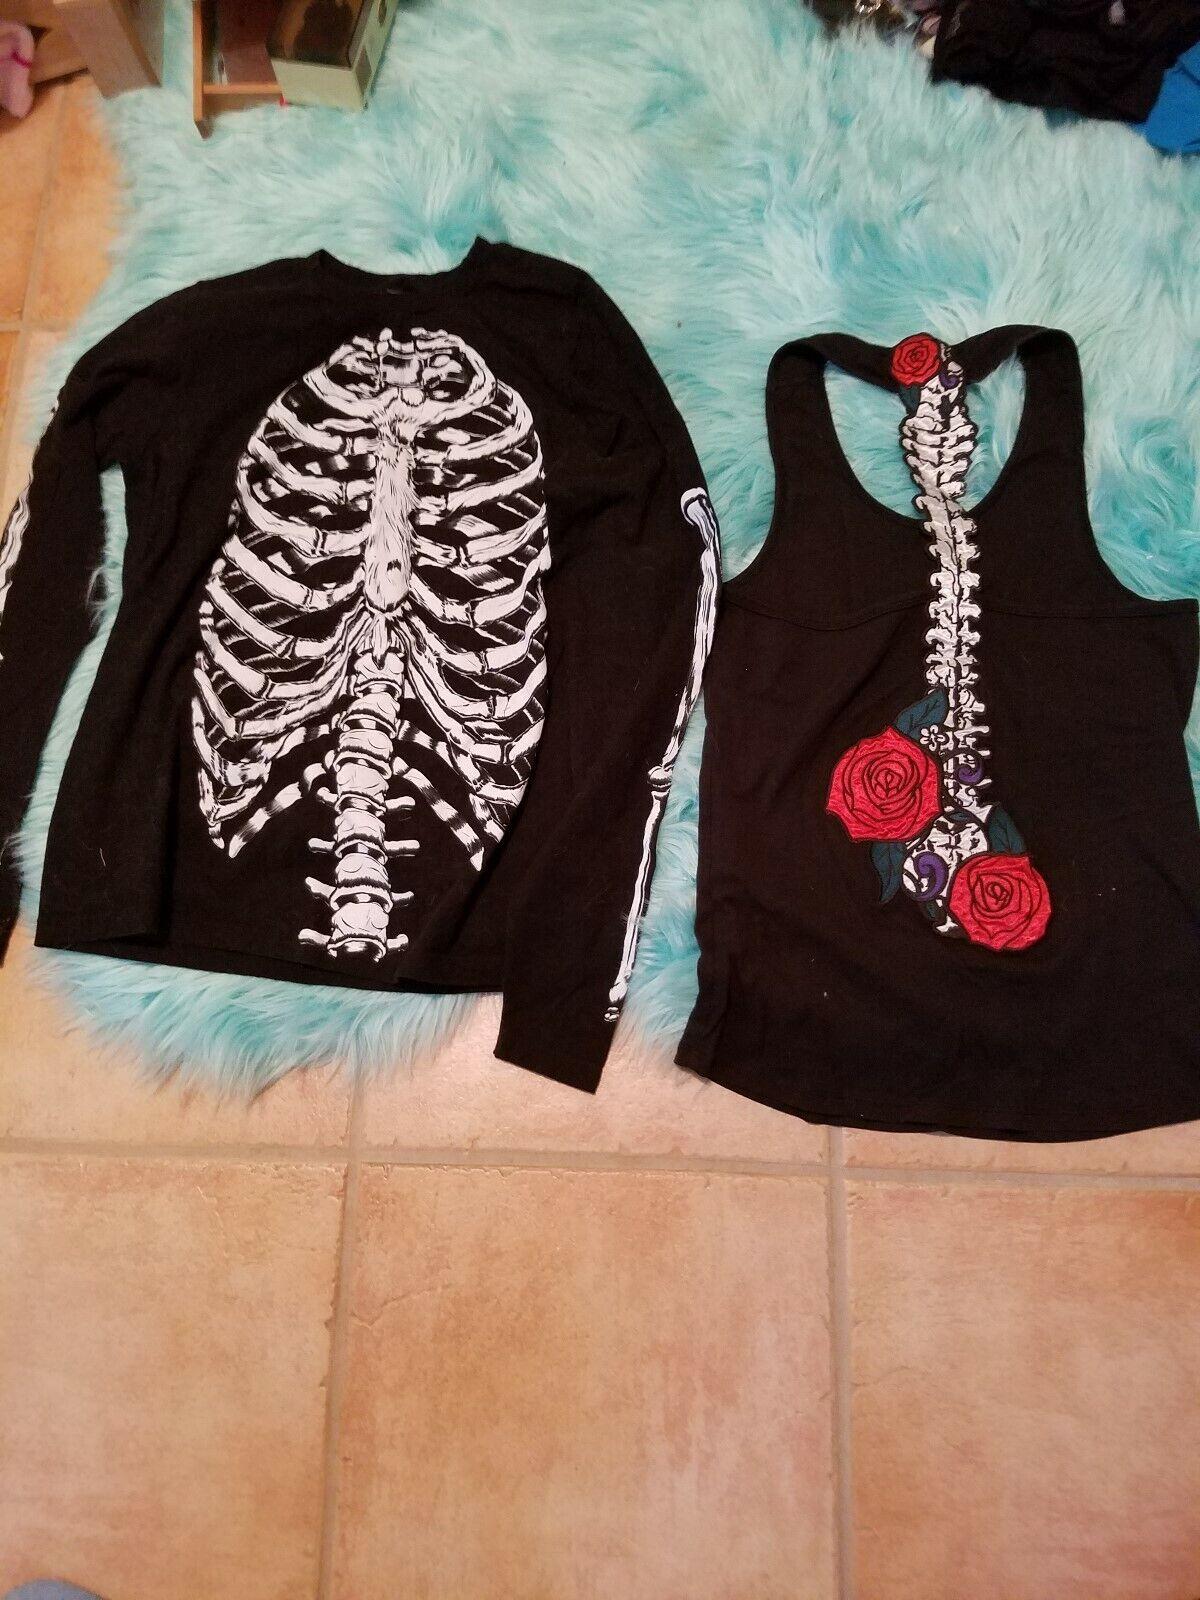 lot of 2 skeleton theme clothing. Sz m t back tank and long sleeve shirt sz S